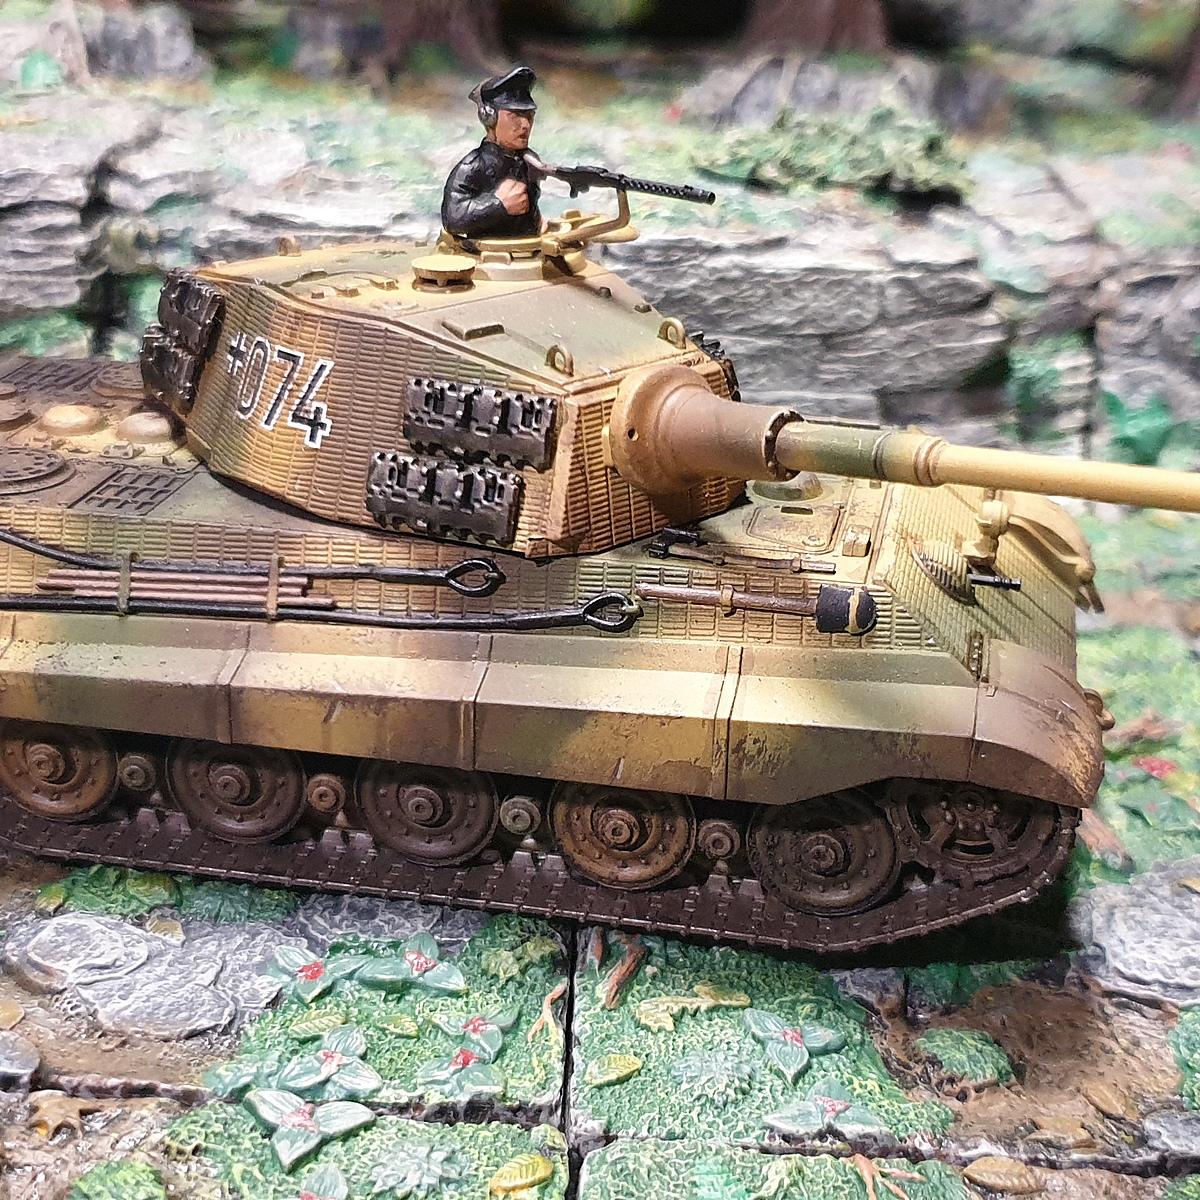 German WWII tanks - 3 Colour Camo